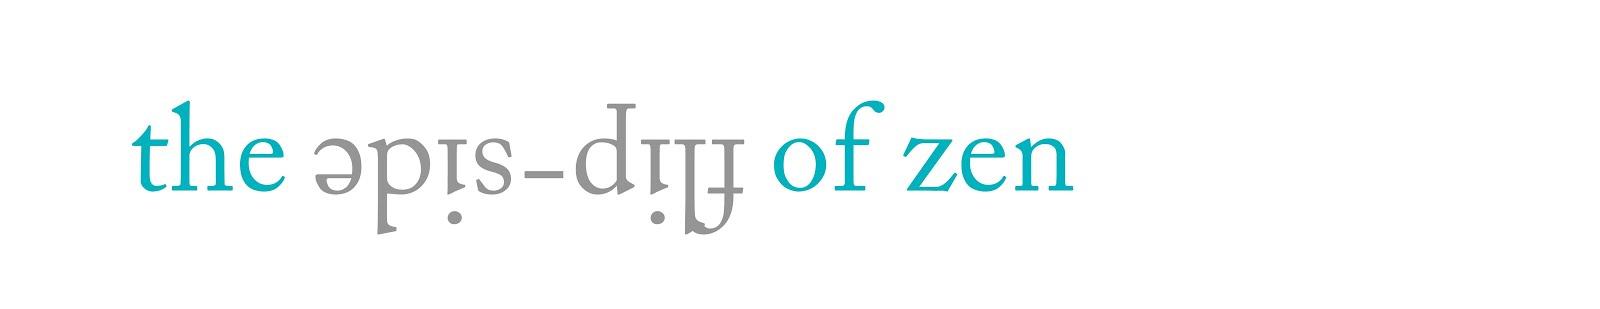 The Flip-side of Zen